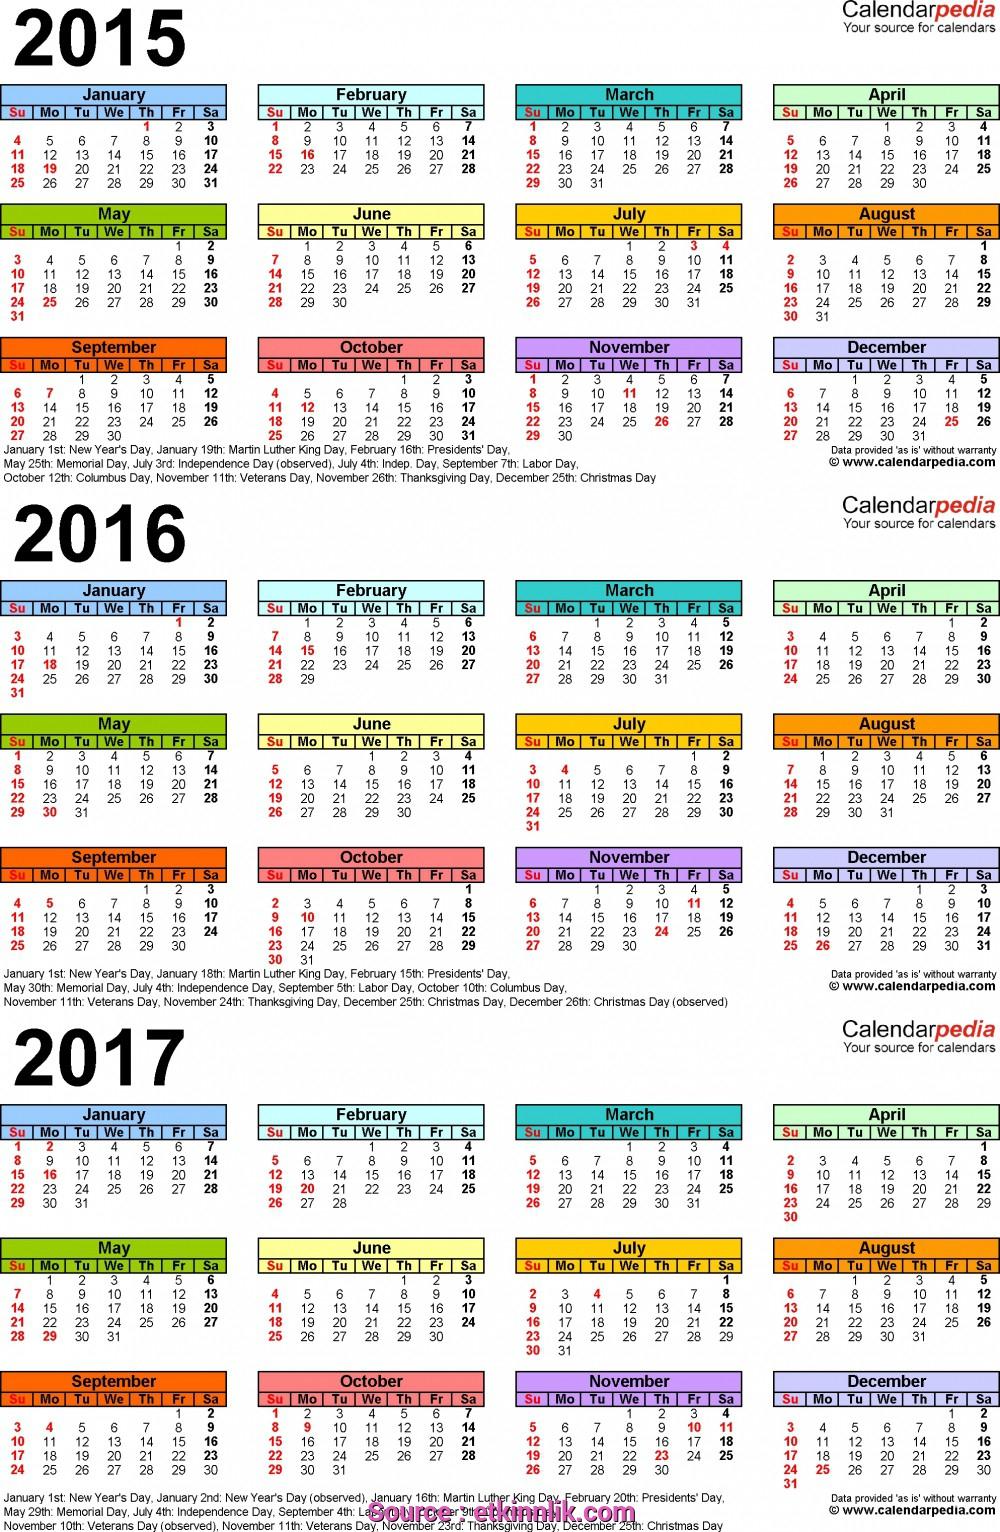 Bengali Calendar 1424  Google Search intended for Bangla Calendar 2015